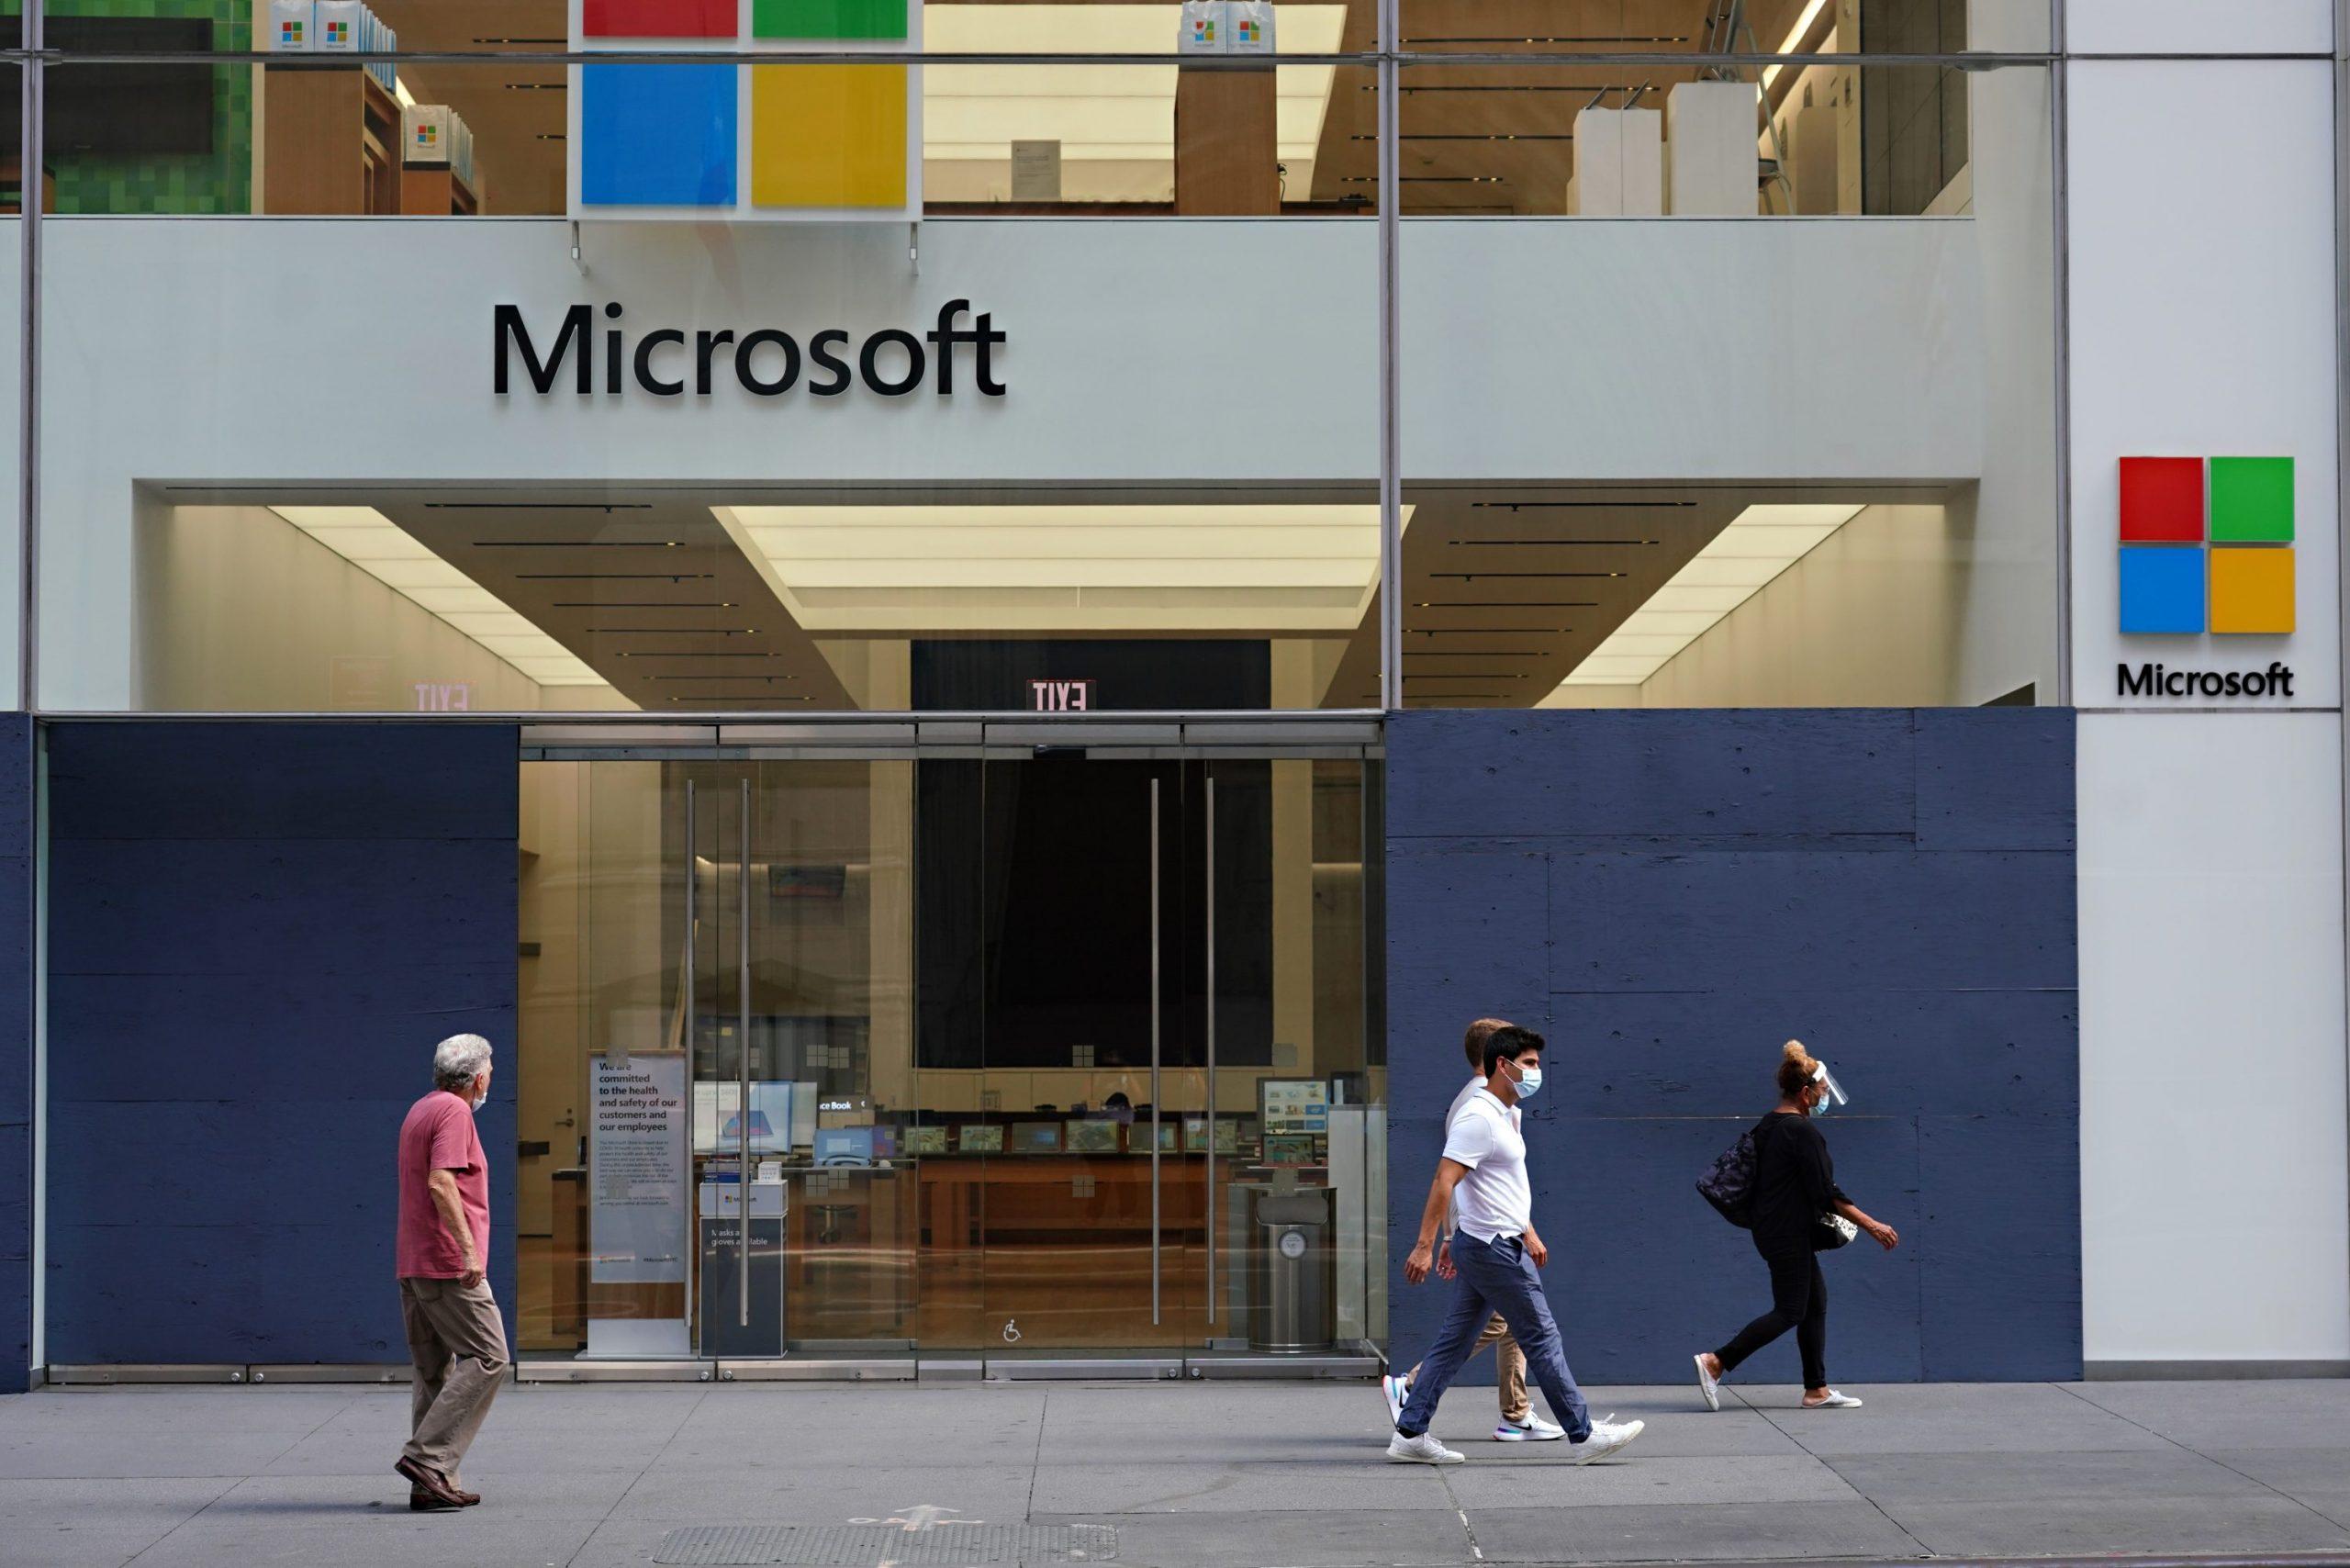 MIT Tech Review: オープンAI、GPT-3の独占ライセンスをマイクロソフトに供与